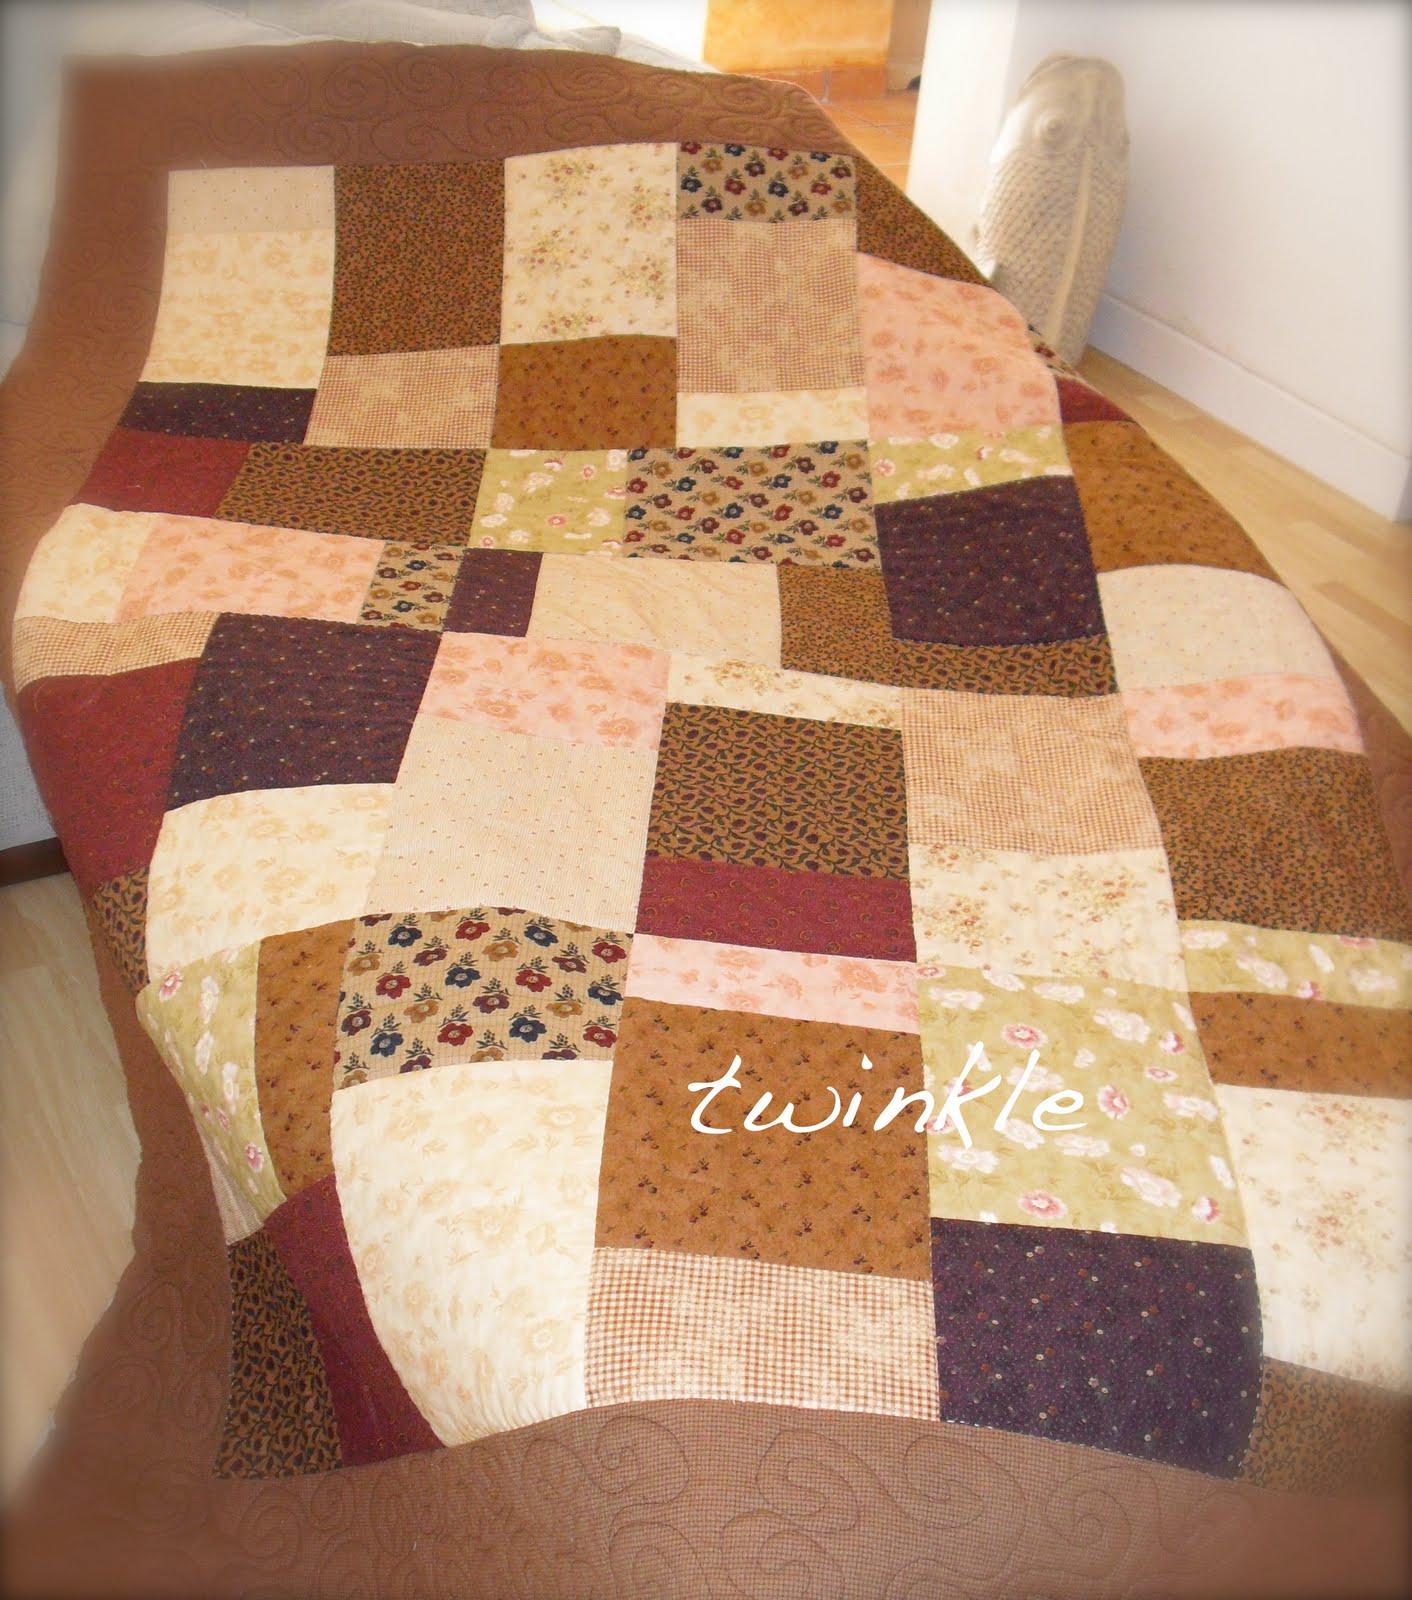 Twinkle patchwork colchas para regalar - Colchas de patchwork modernas ...